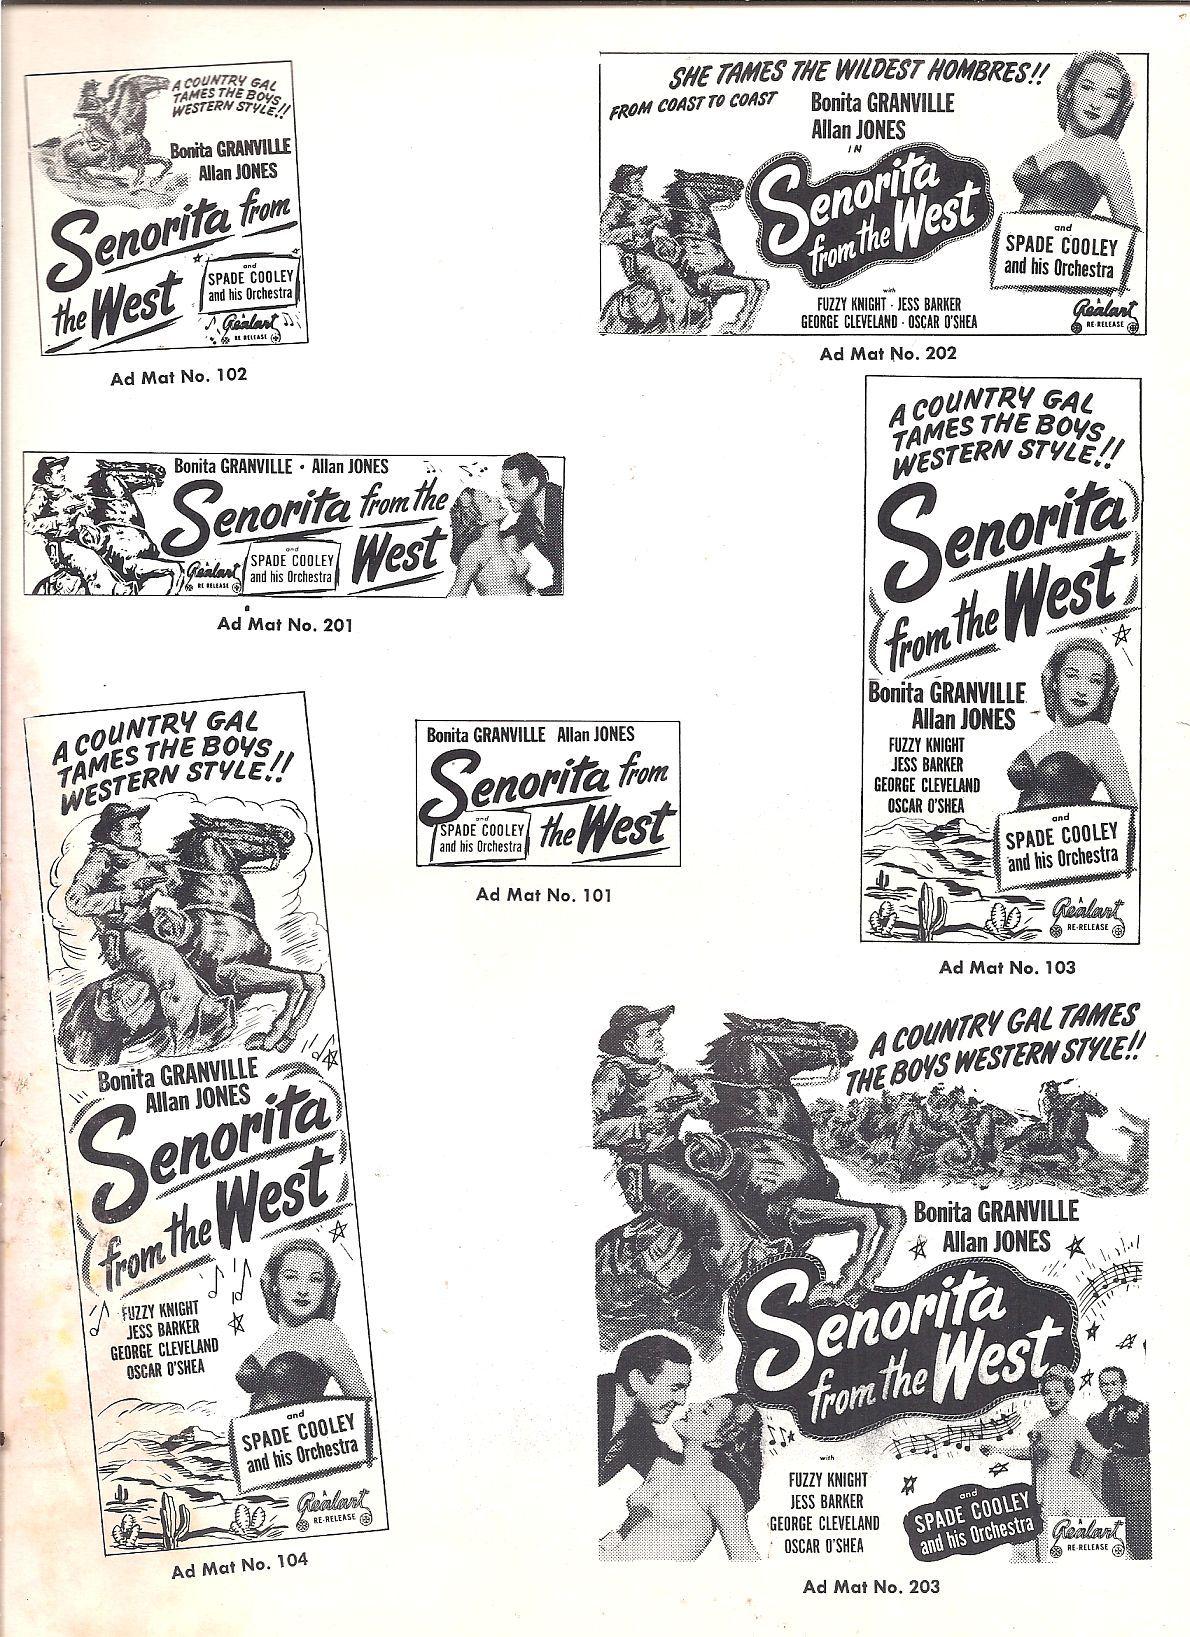 Jess Barker, Bonita Granville, and Allan Jones in Senorita from the West (1945)